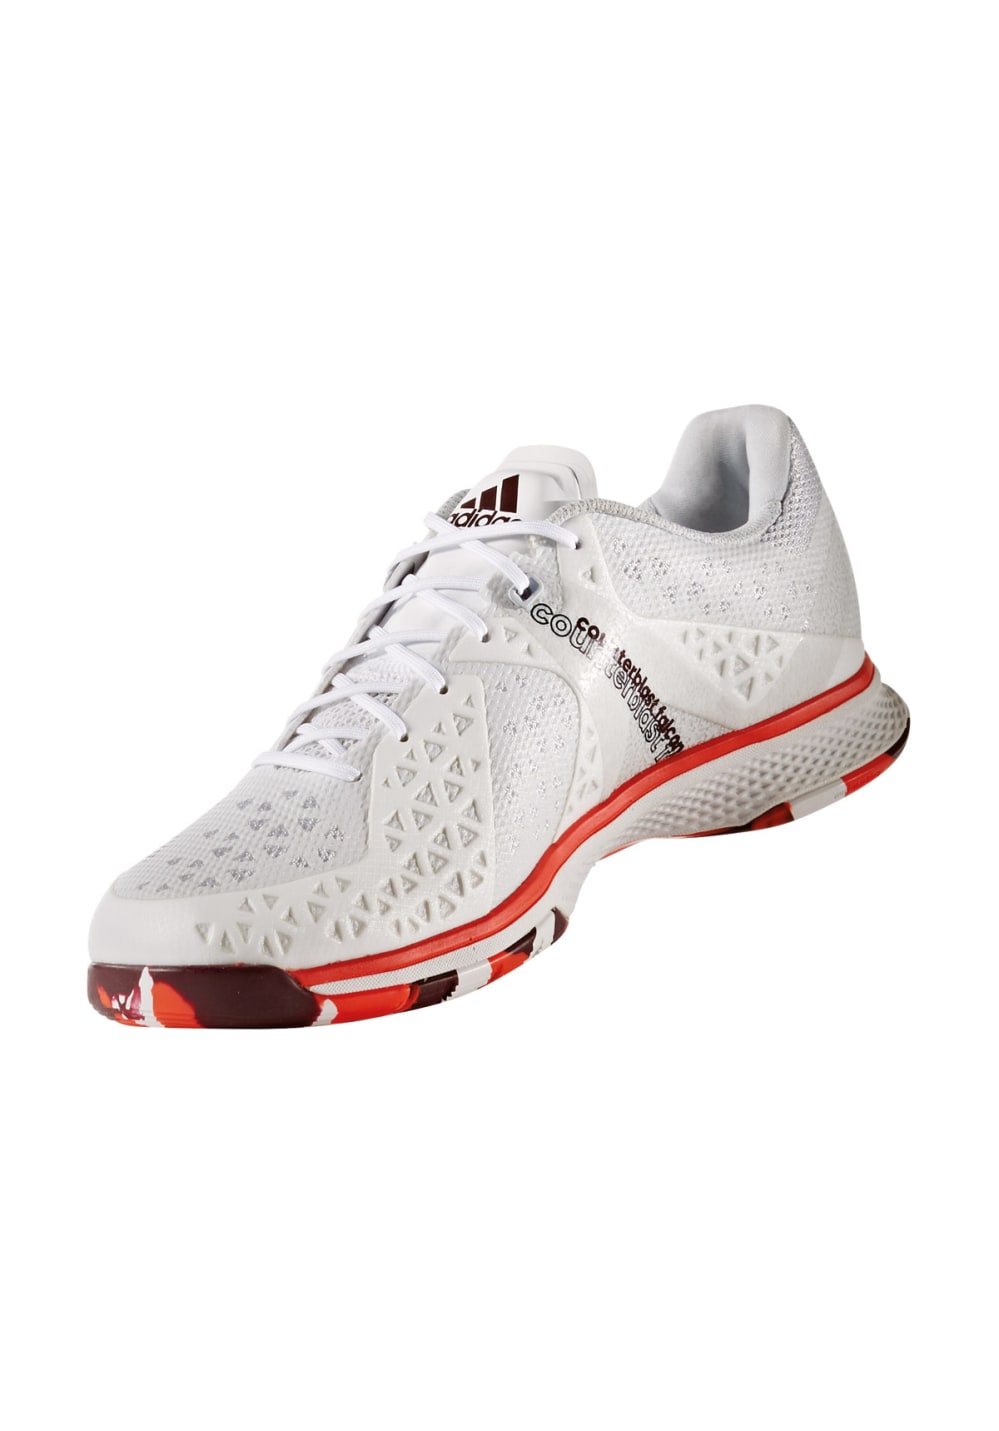 best website 1b579 f695a counterblast chaussures handball